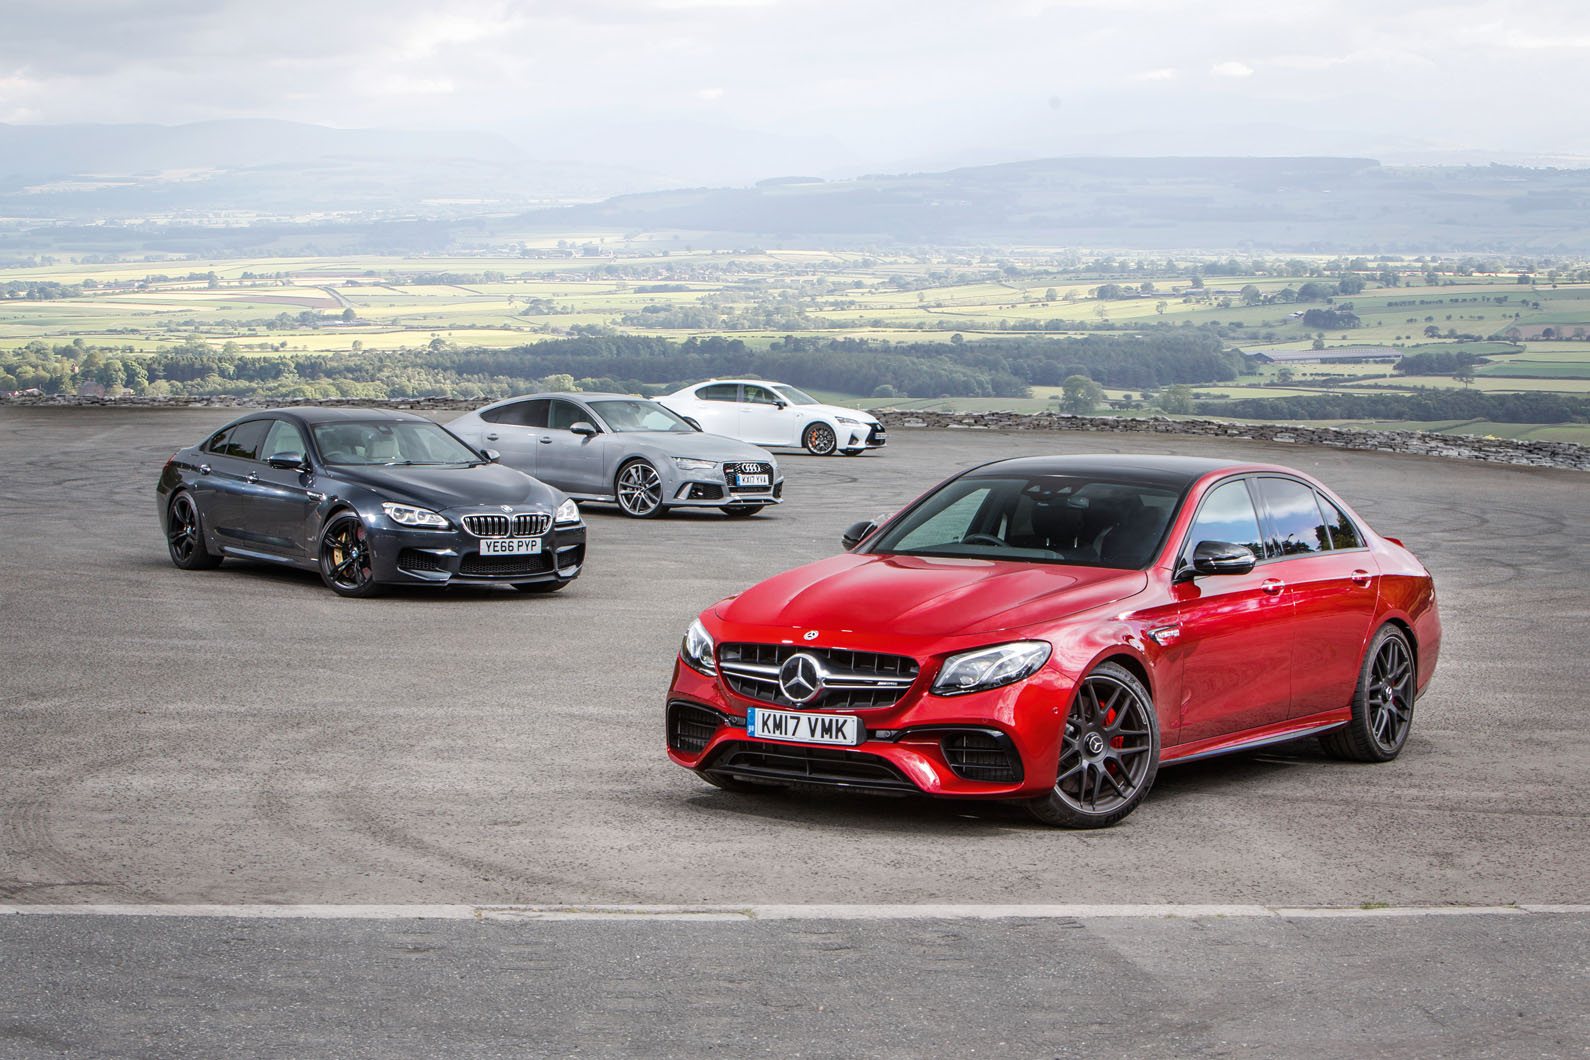 Mercedes-AMG E 63 против Audi RS7 Sportback, Lexus GS F, BMW M6 Gran Coupe — групповой тест